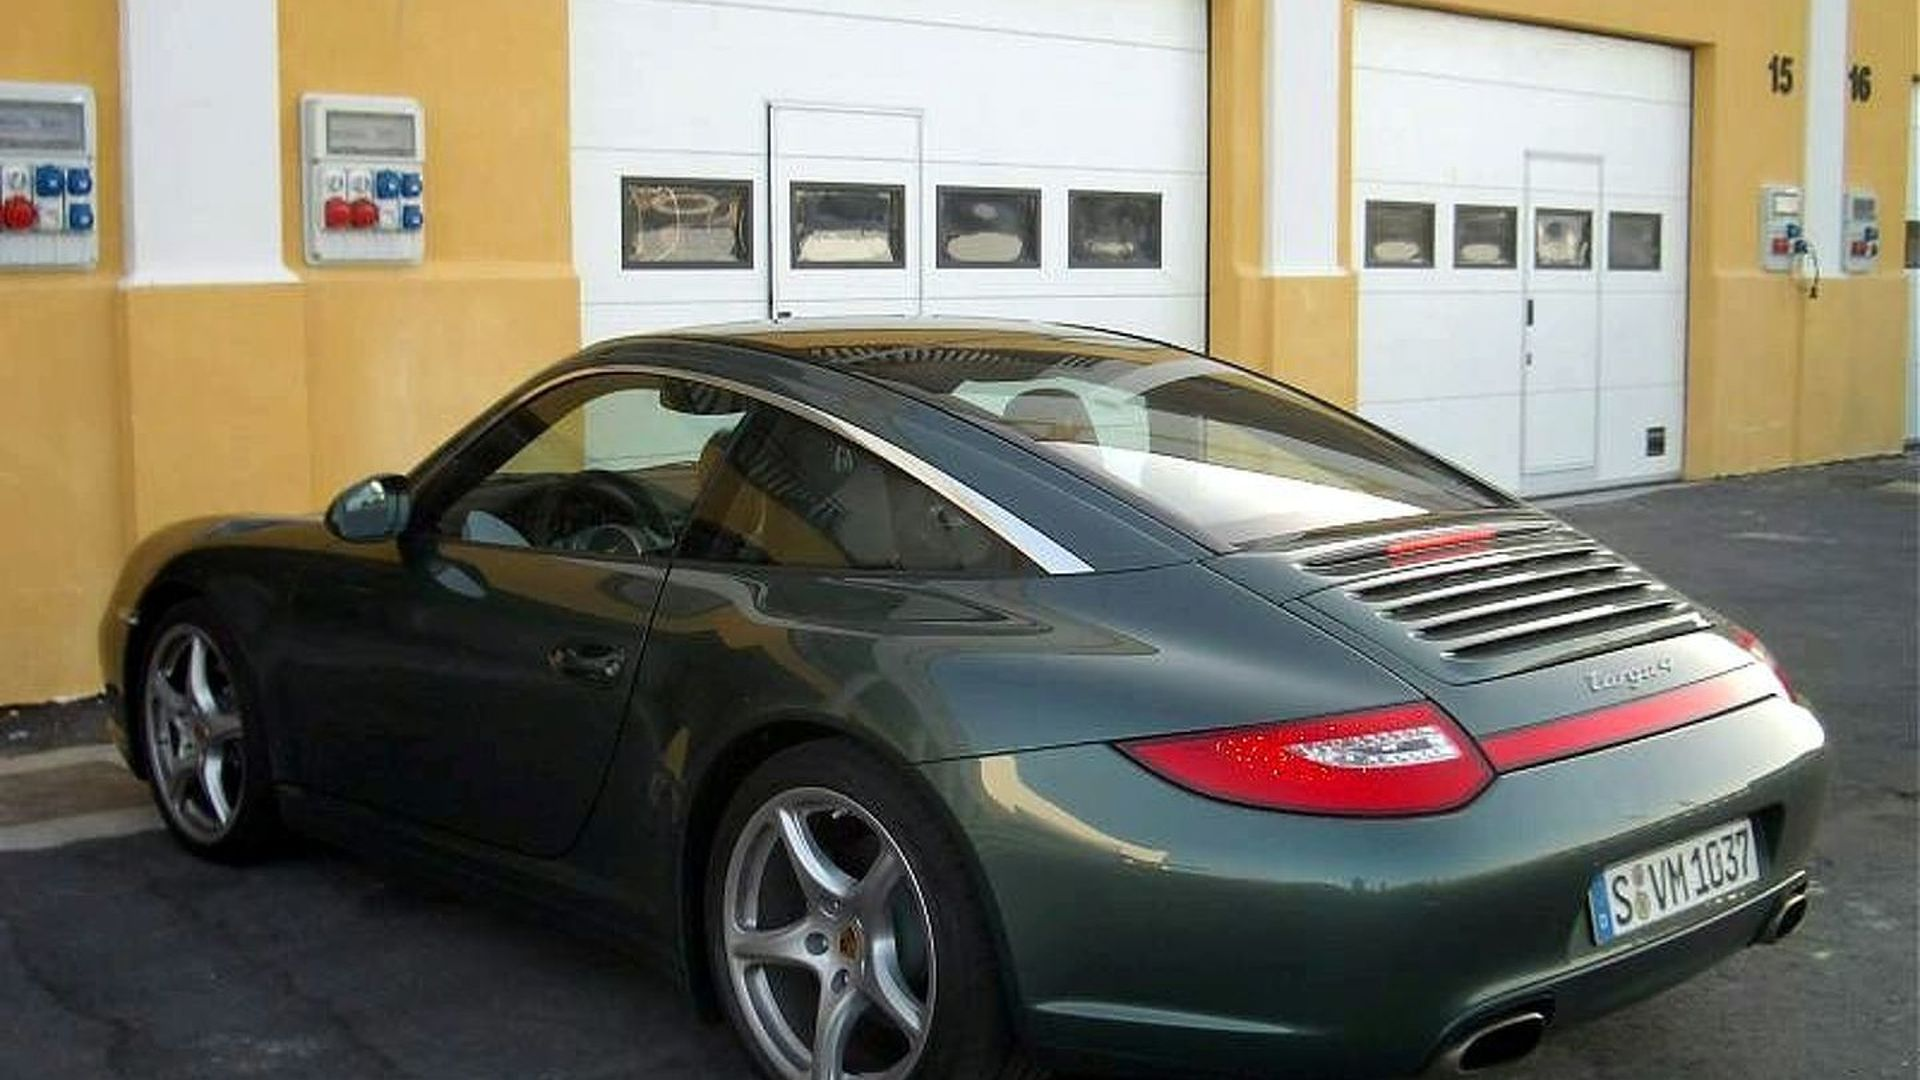 Porsche 997 Targa Facelift Caught Prior to Launch